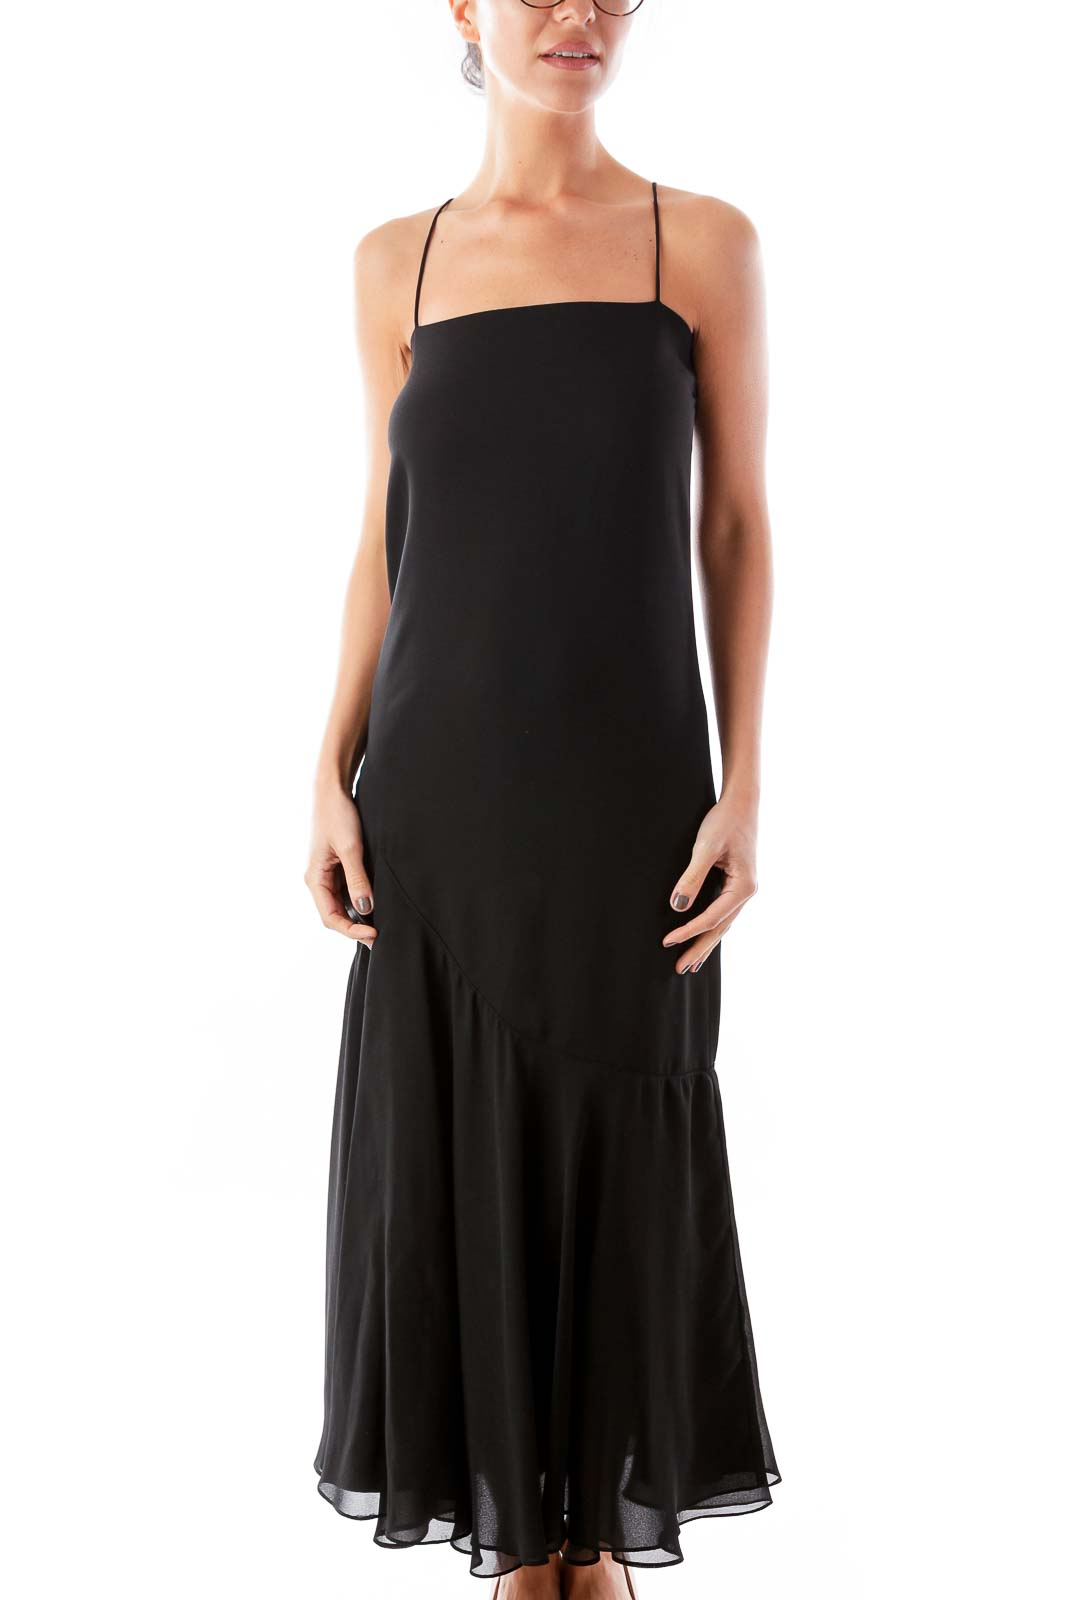 Black Long Cocktail Dress Front